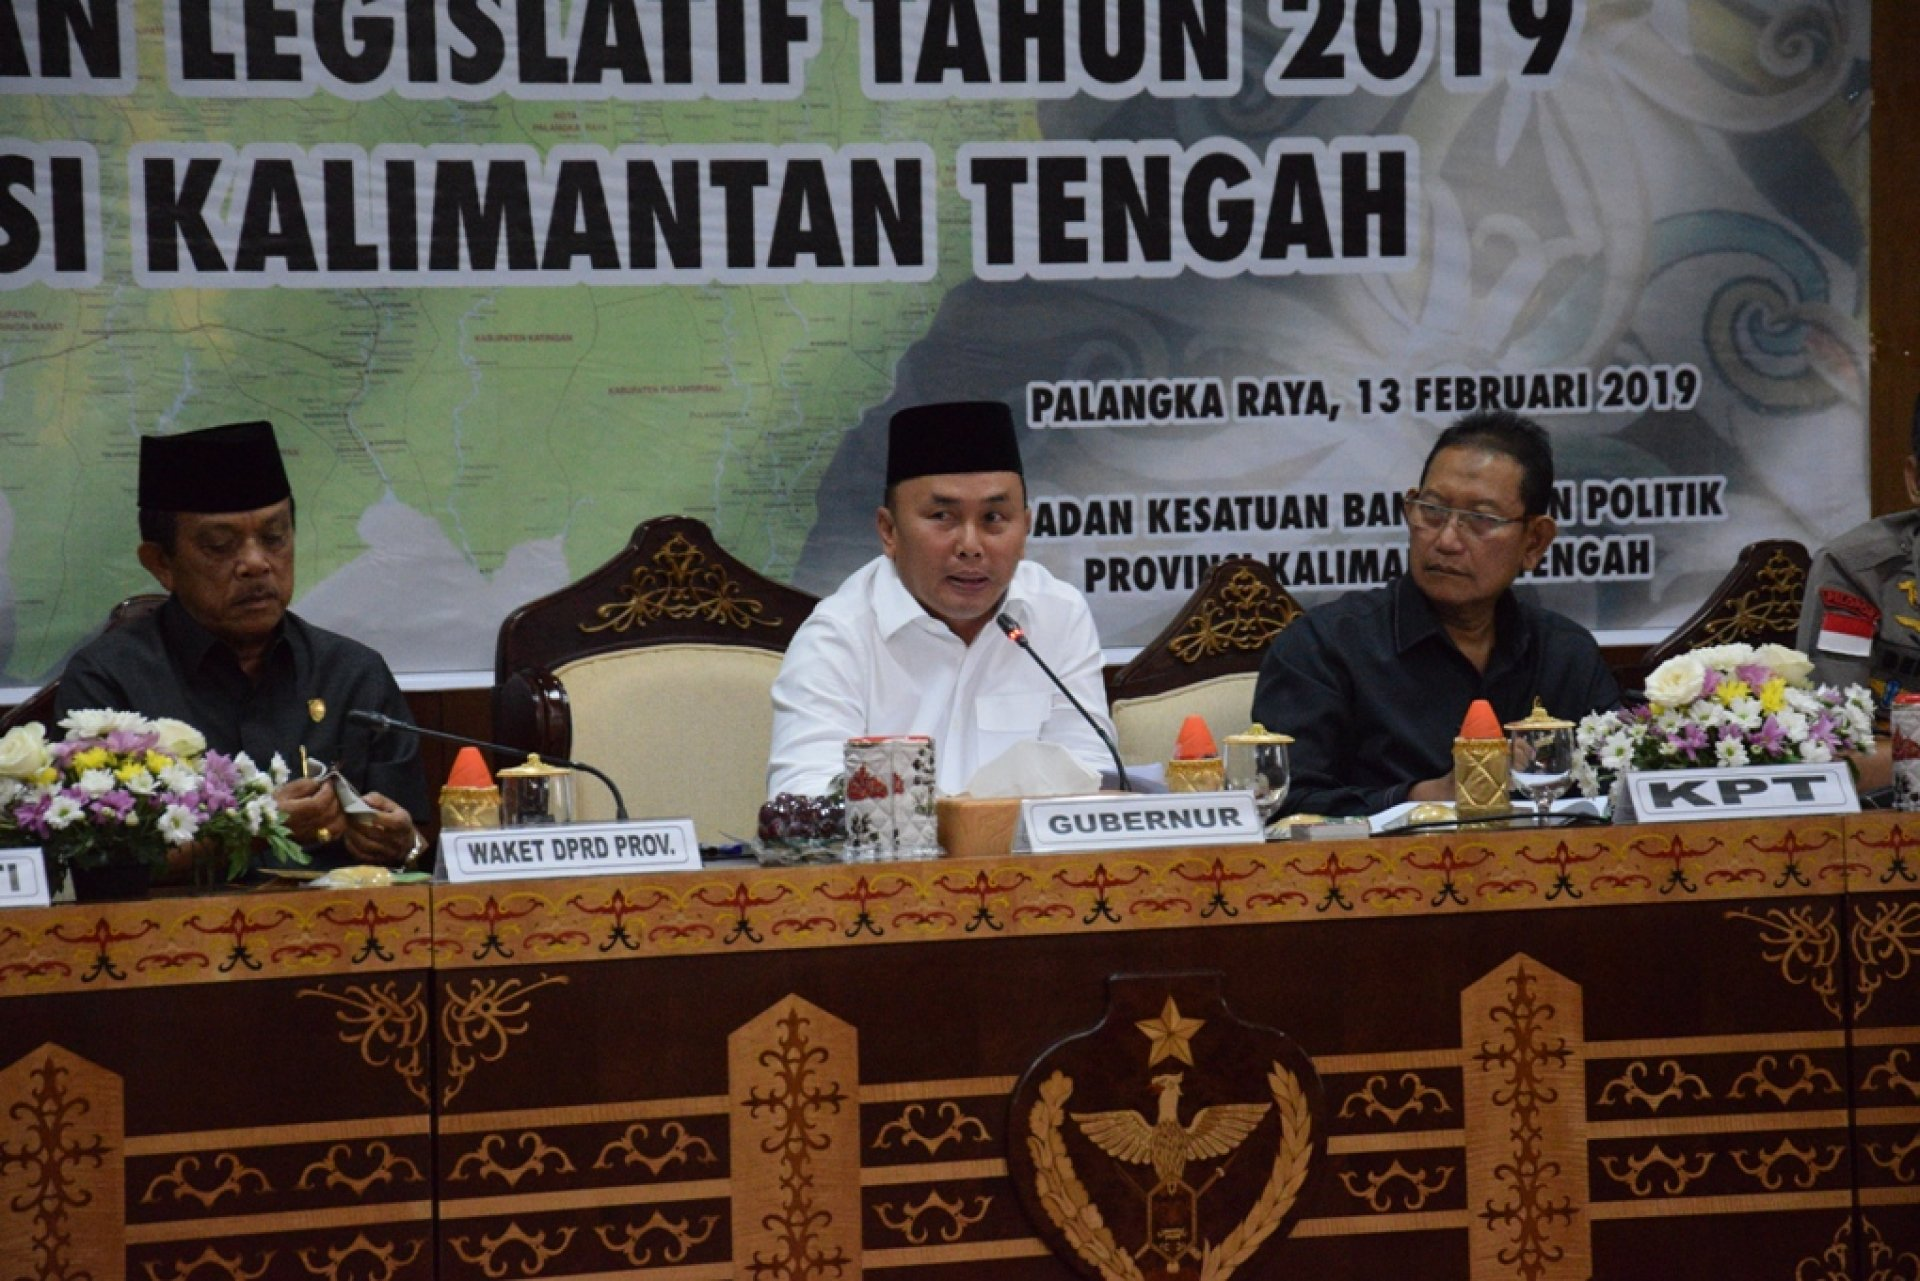 Gubernur Sugianto Ajak Masyarakat Kalteng Sambut Pesta Demokrasi Dengan Semangat dan Kegembiraan